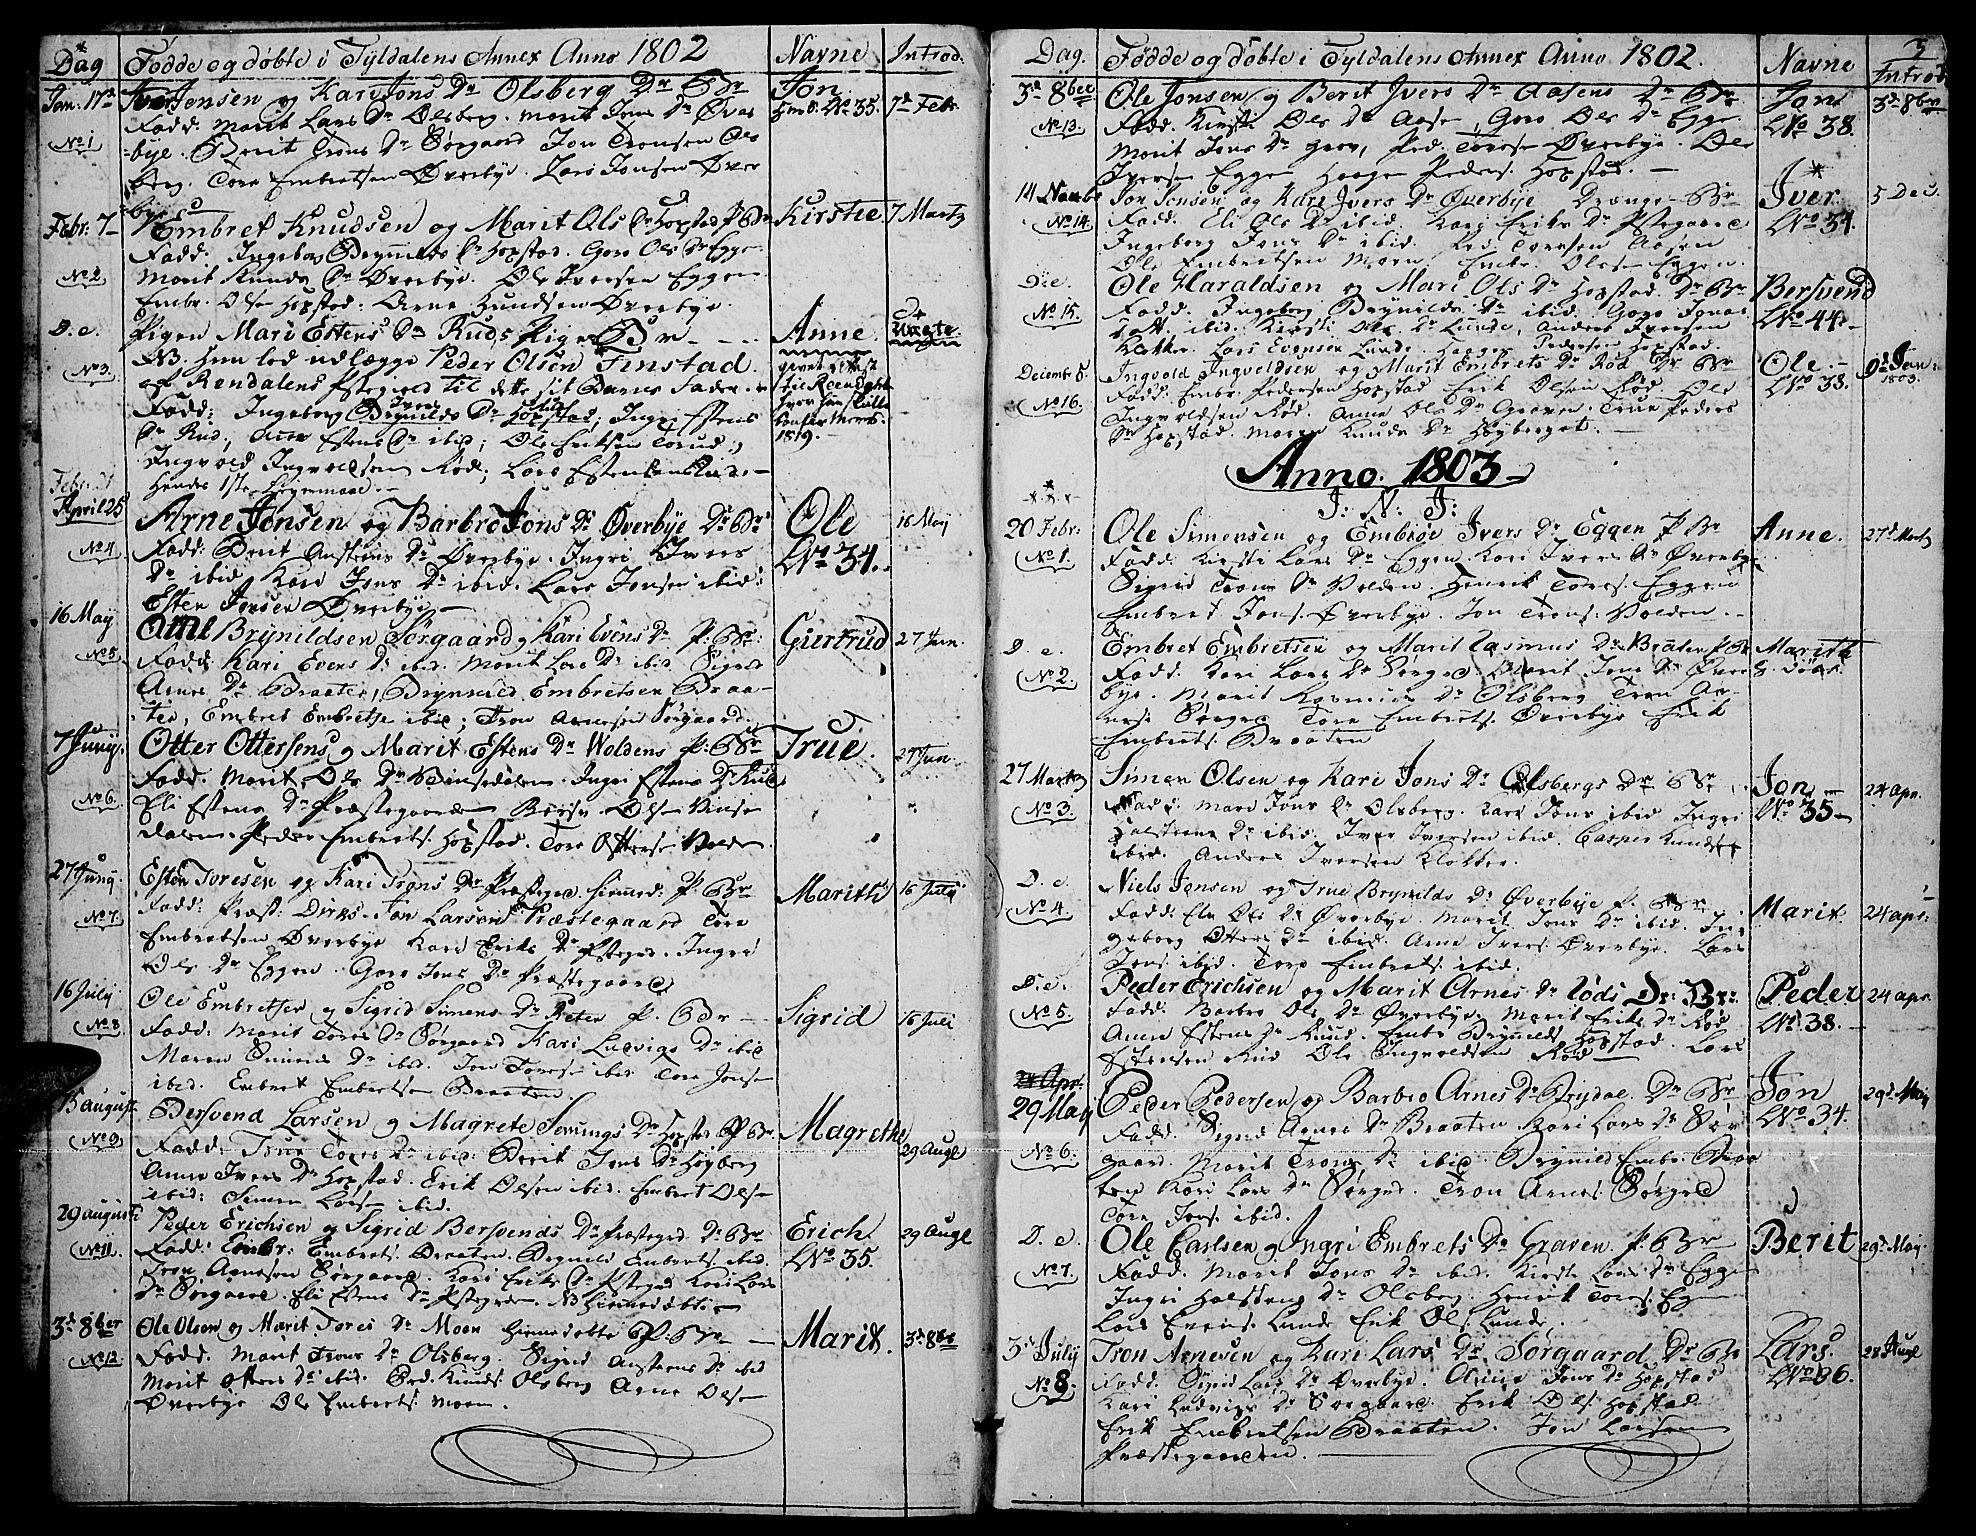 SAH, Tynset prestekontor, Ministerialbok nr. 17, 1801-1814, s. 3